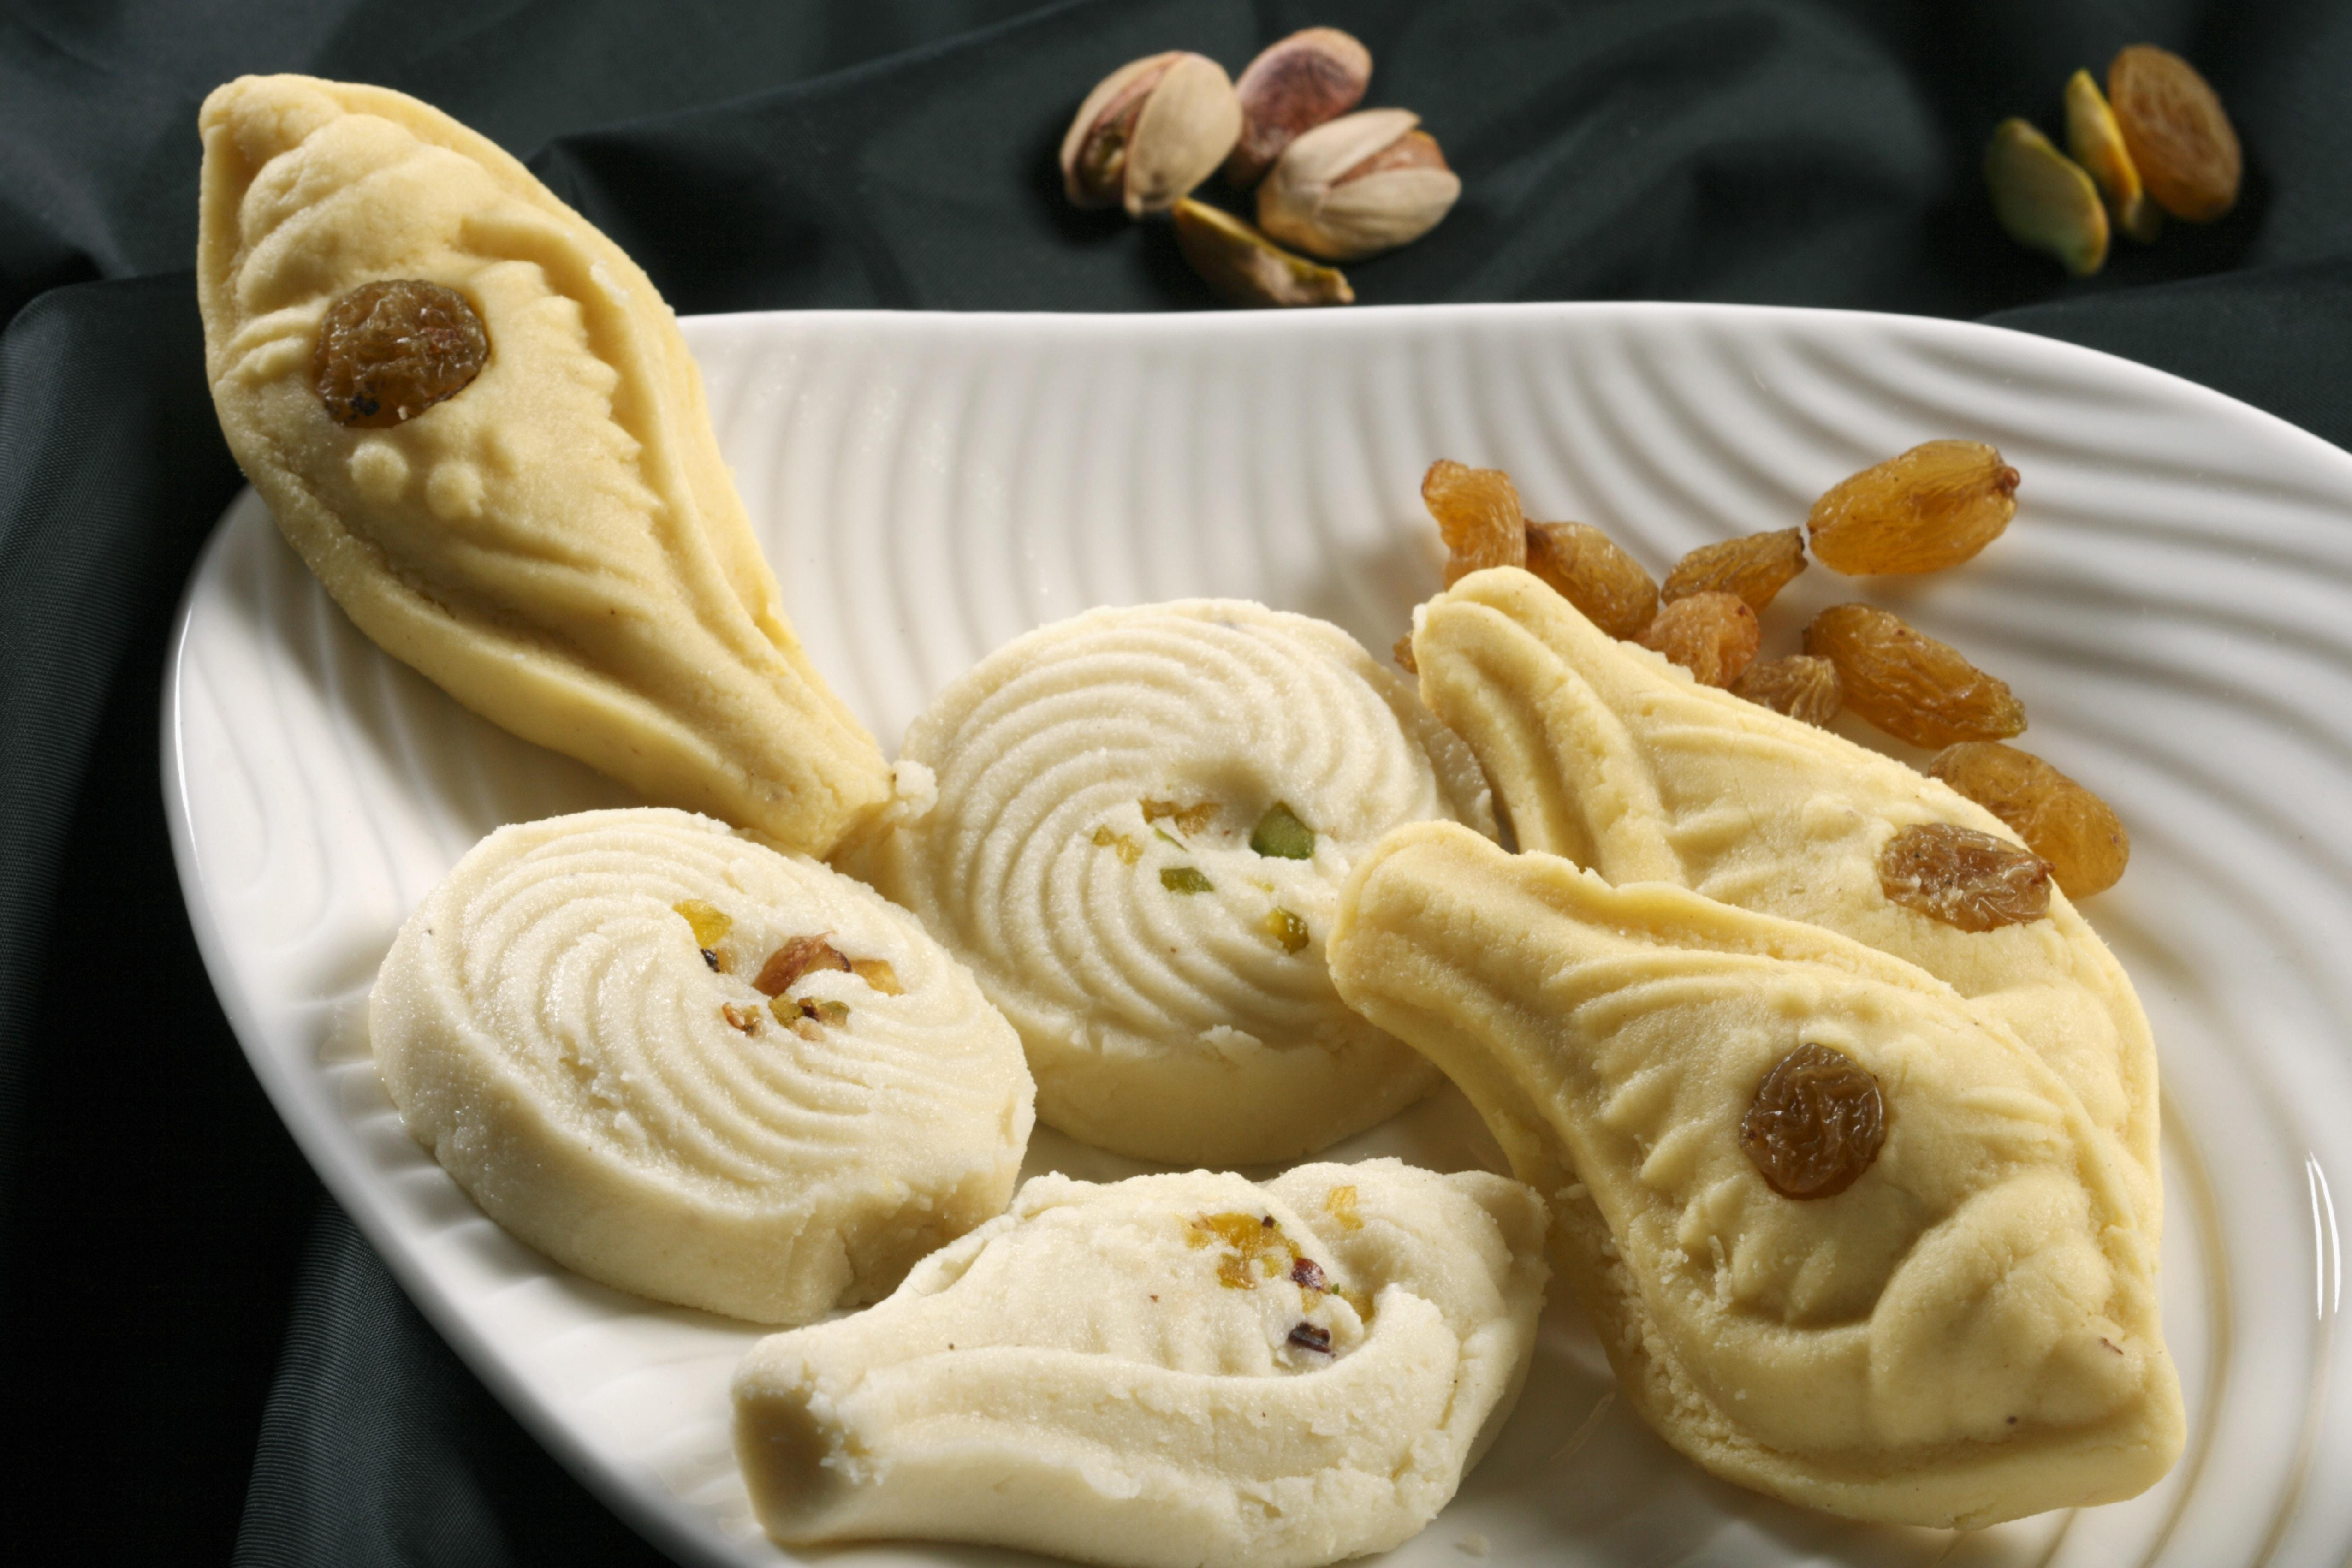 Diabetic sweets – Nutritional value in Sandesh